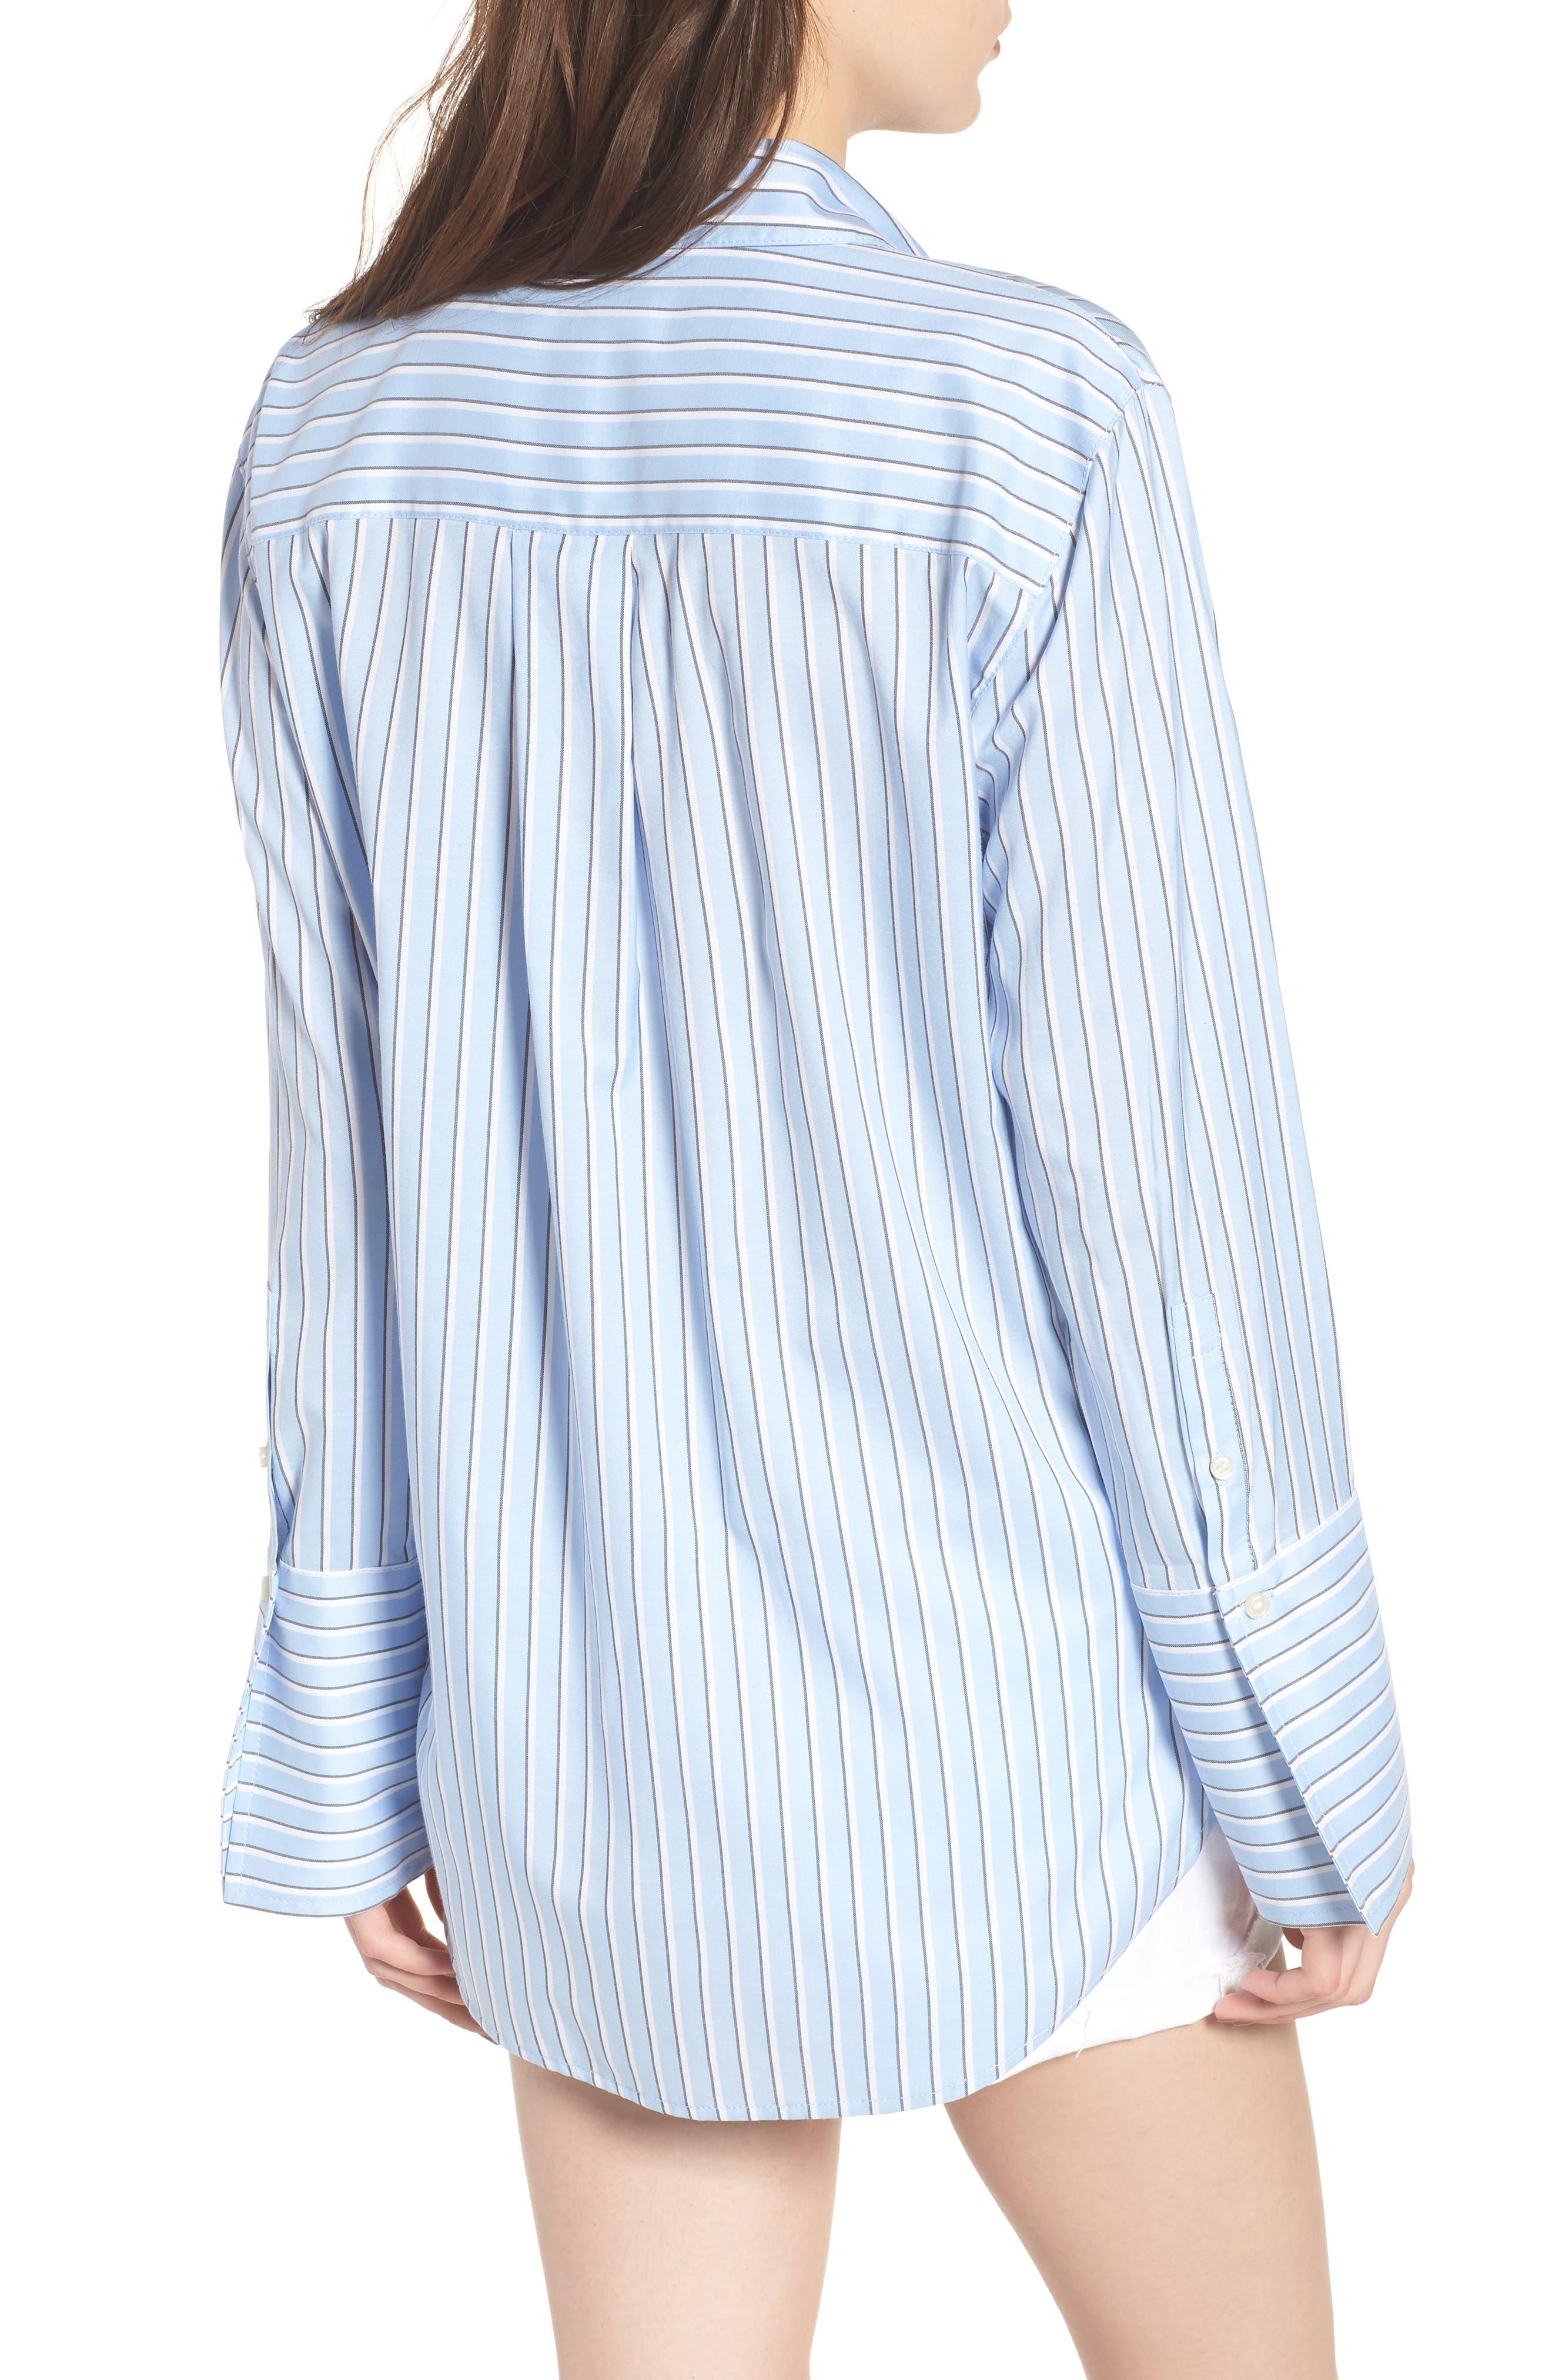 Stripe Button Front Shirt,                             Alternate thumbnail 2, color,                             Blue Brunnera Groove Stripe